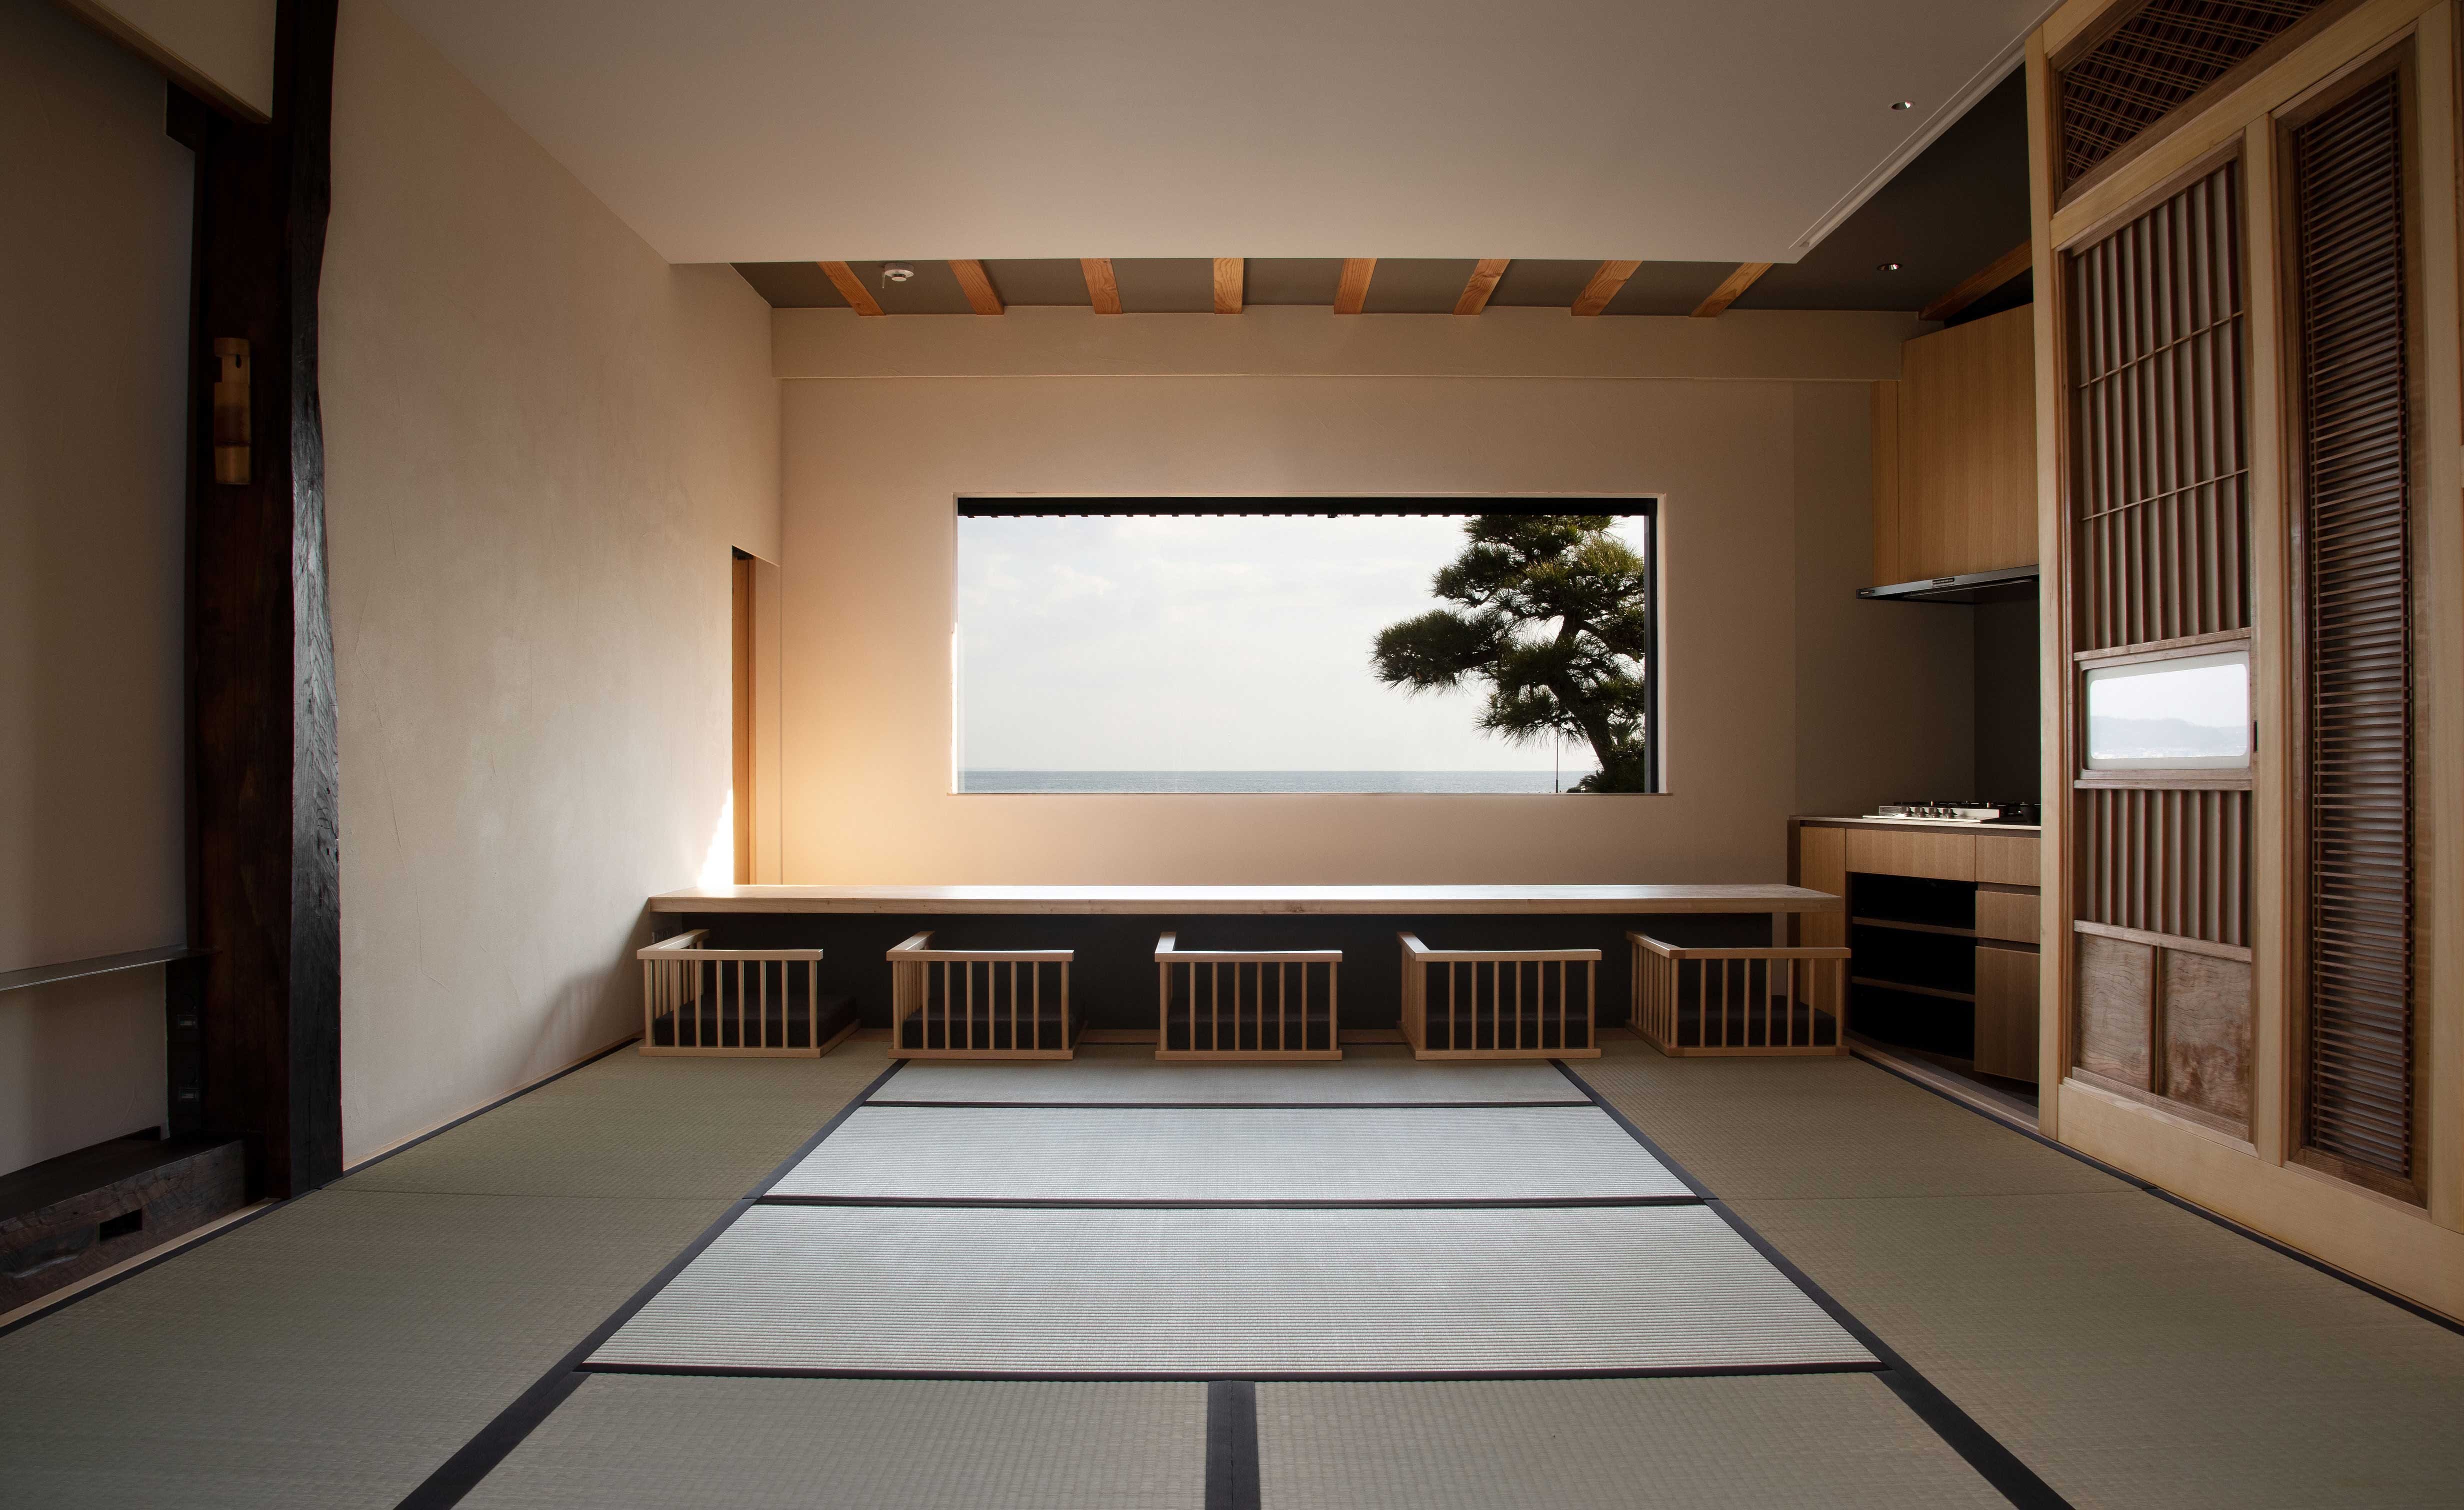 Kishi ke ryokan Kamakura Japan Wallpaper 4928x3021